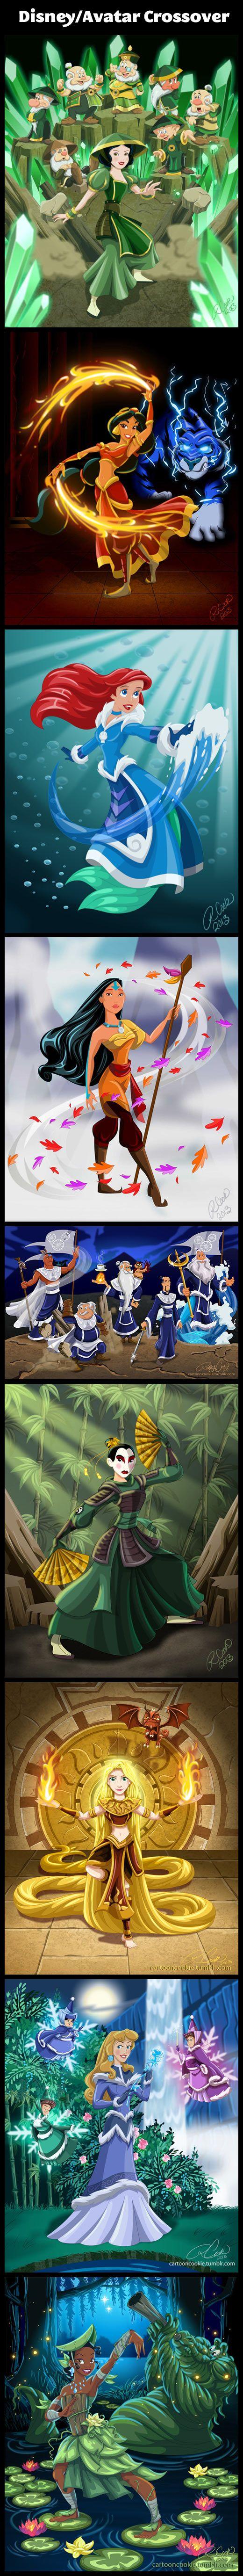 Disney/Avatar Crossover… @Jess Liu Vena  | @Laura Jayson Crum | @Sharron Simmons Reyes | @Danese Smithson Perkins